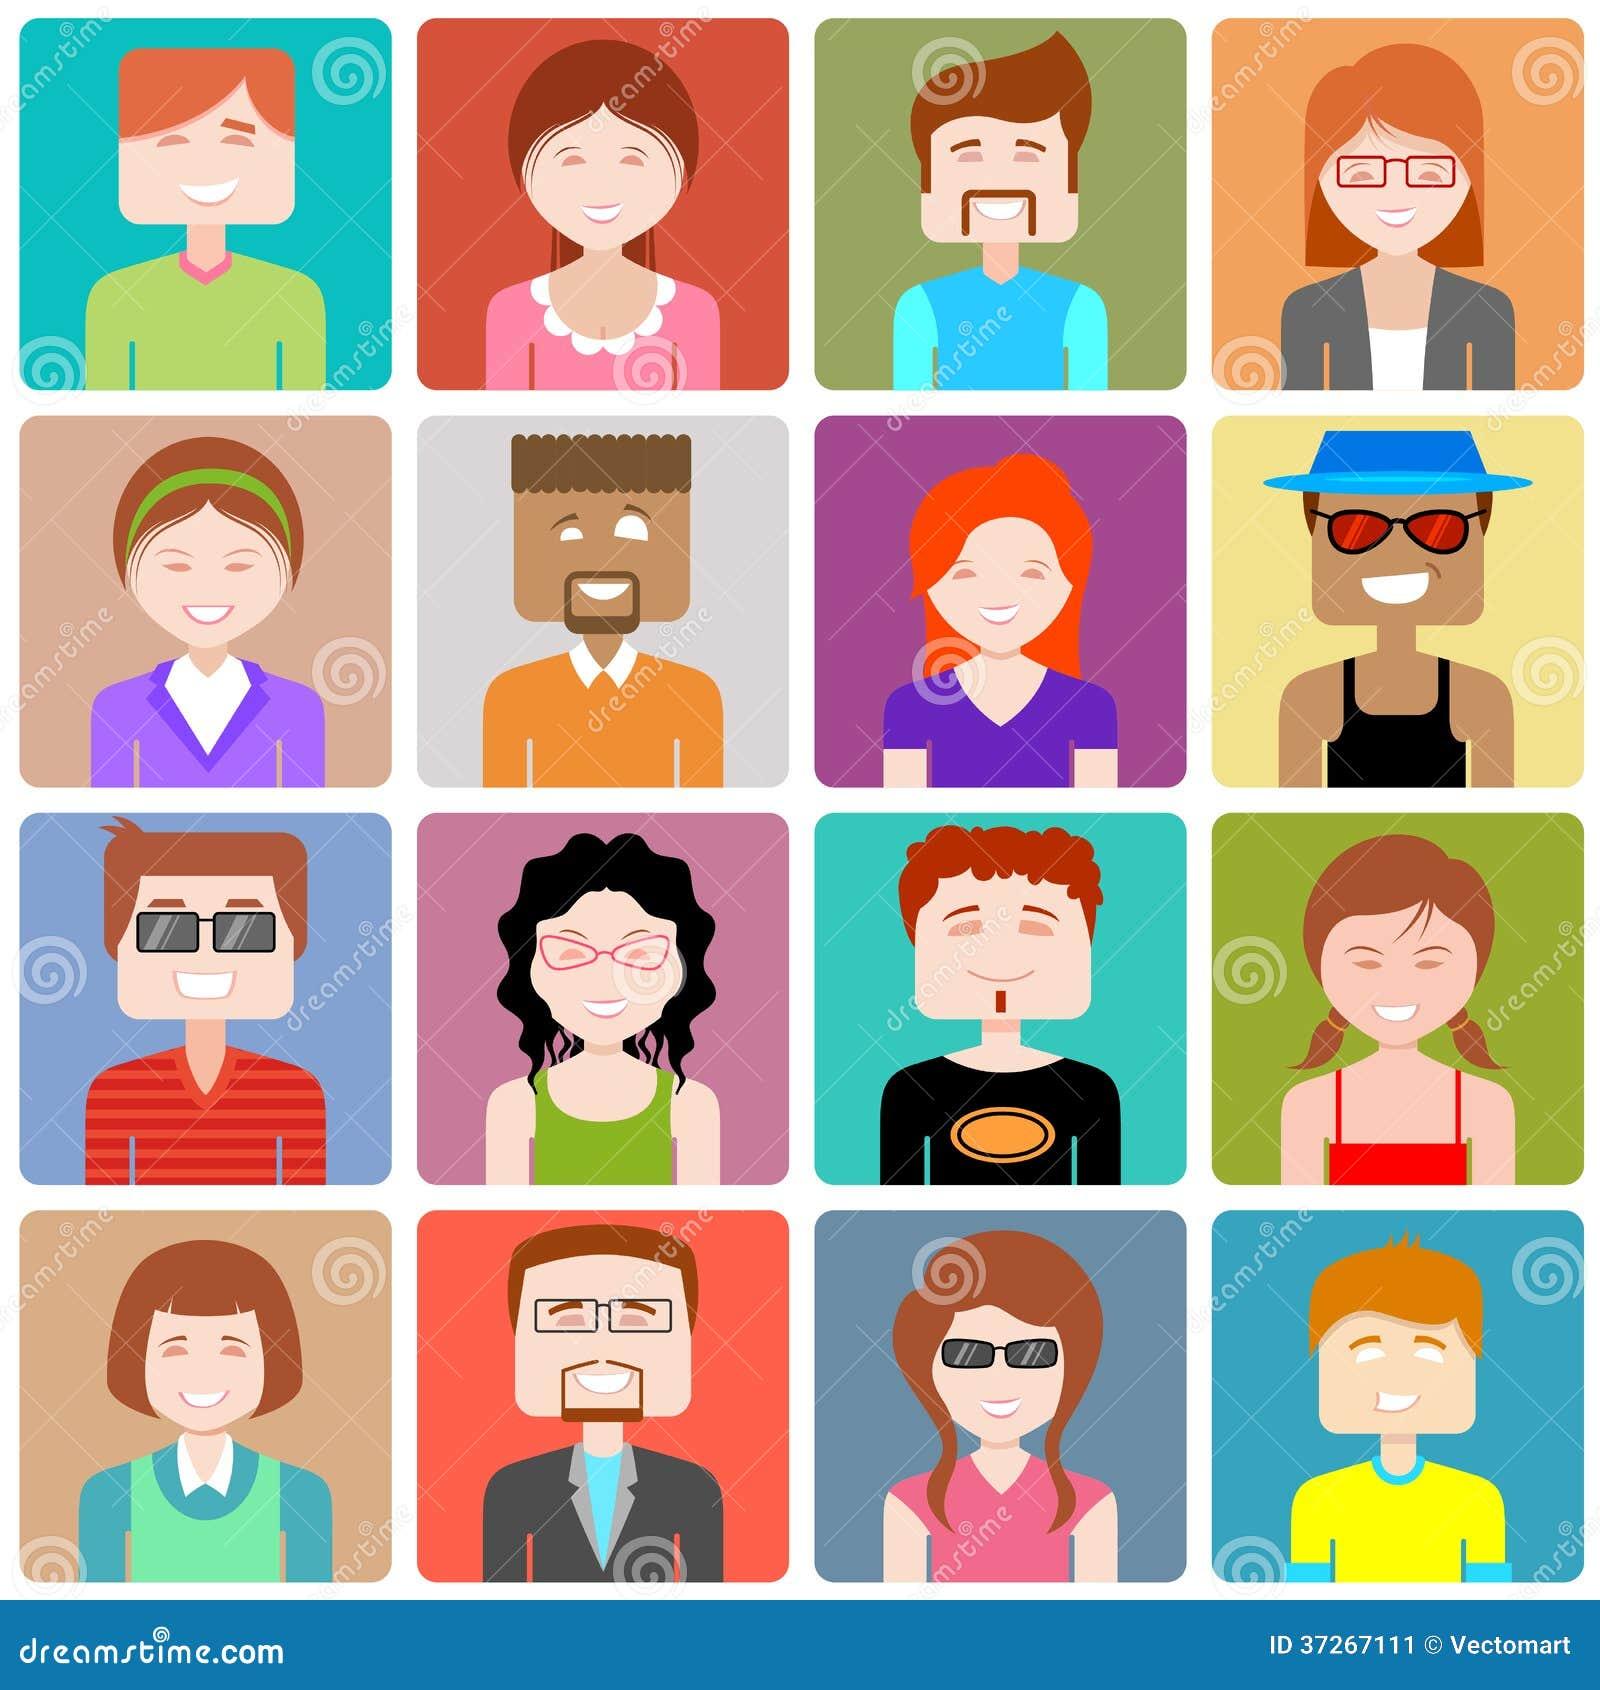 design people Flat Design People Icon Illustration 37267111   Megapixl design people